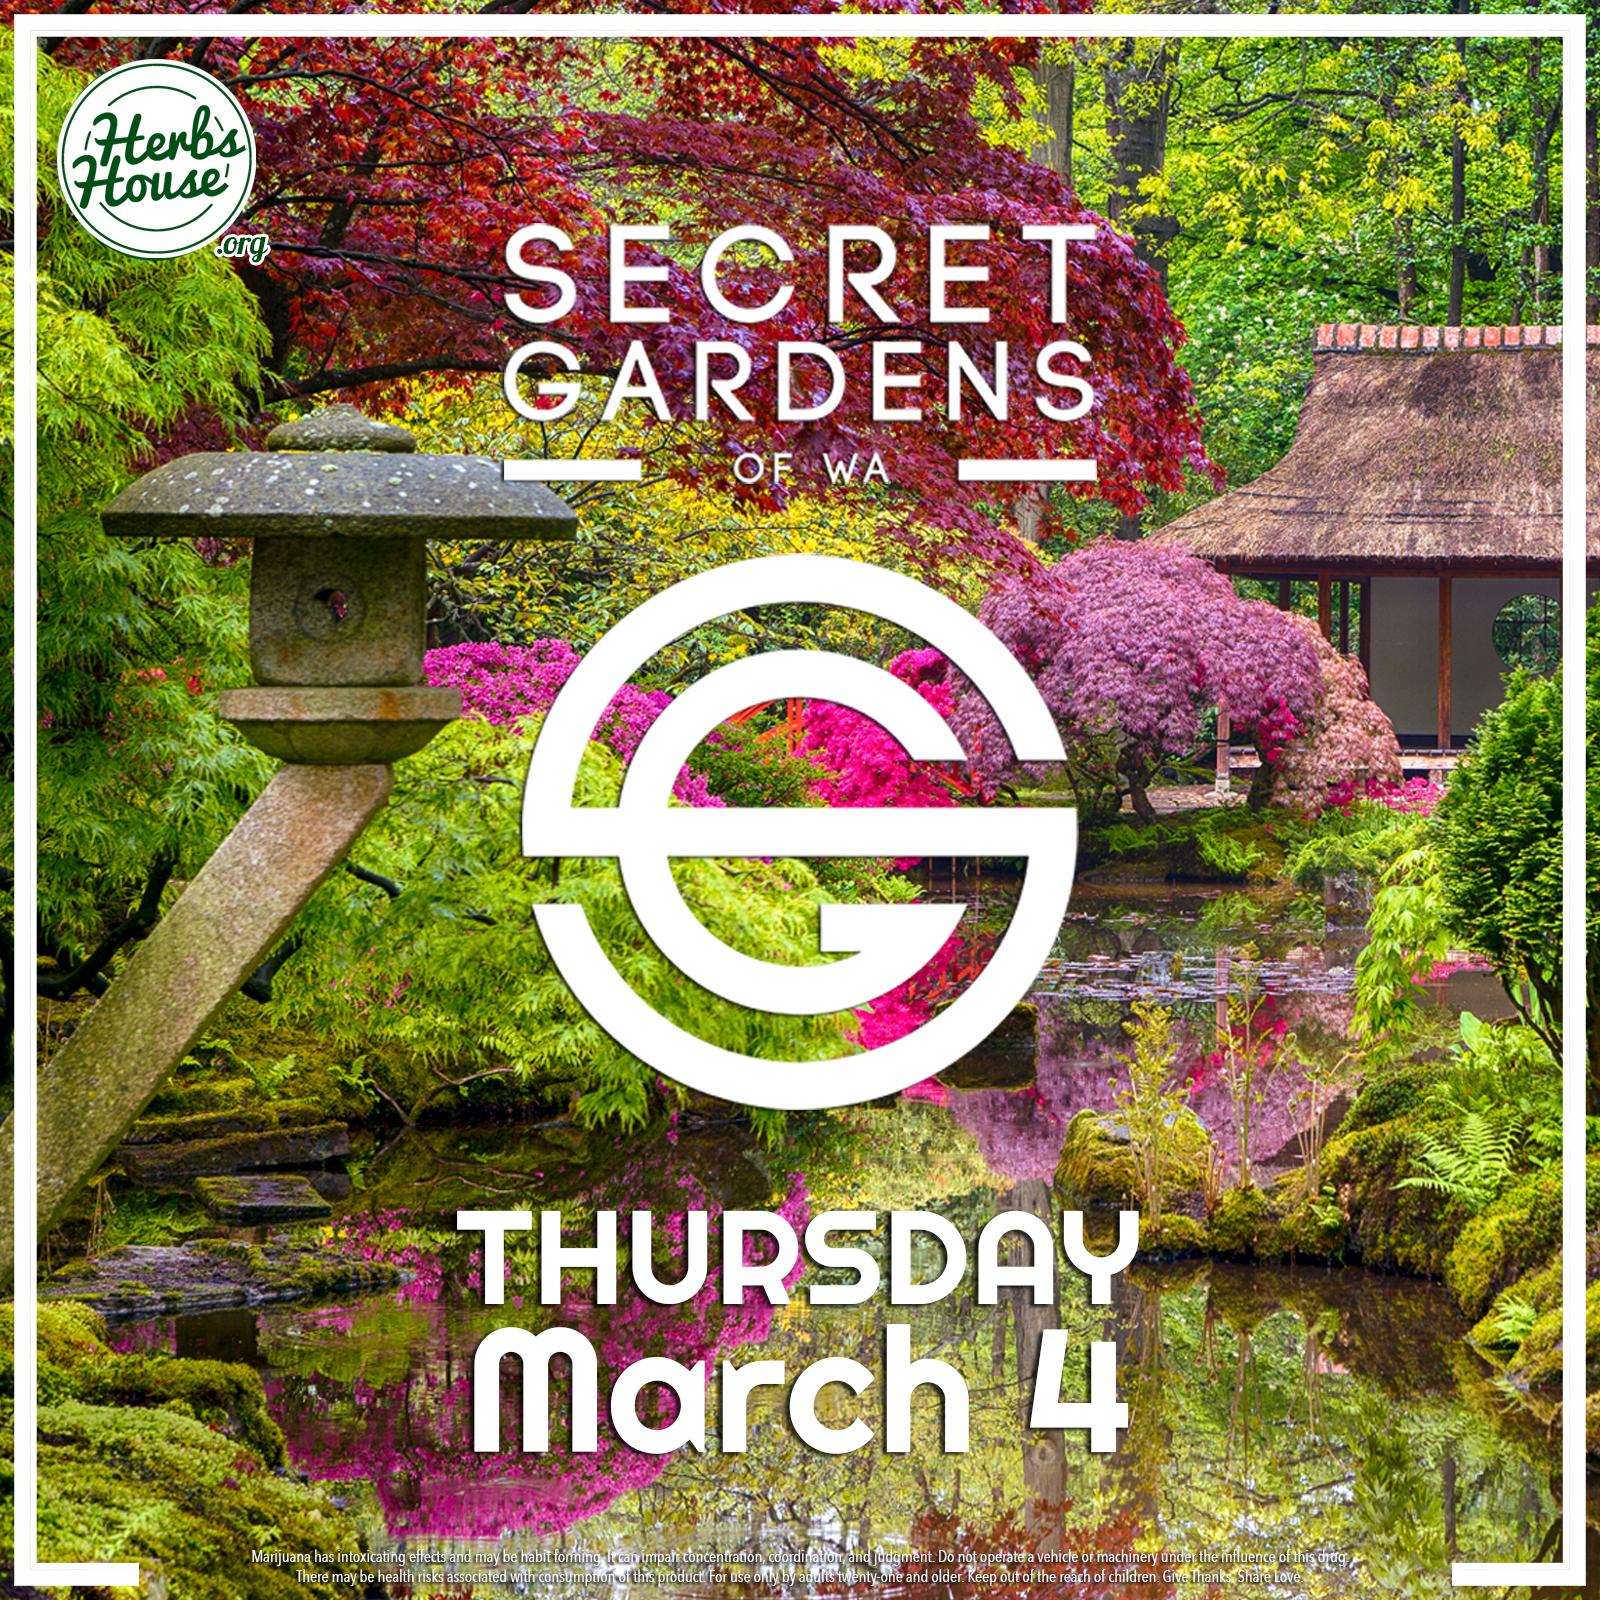 Secret Garden March 4 Featured Vendor SAVE 20%